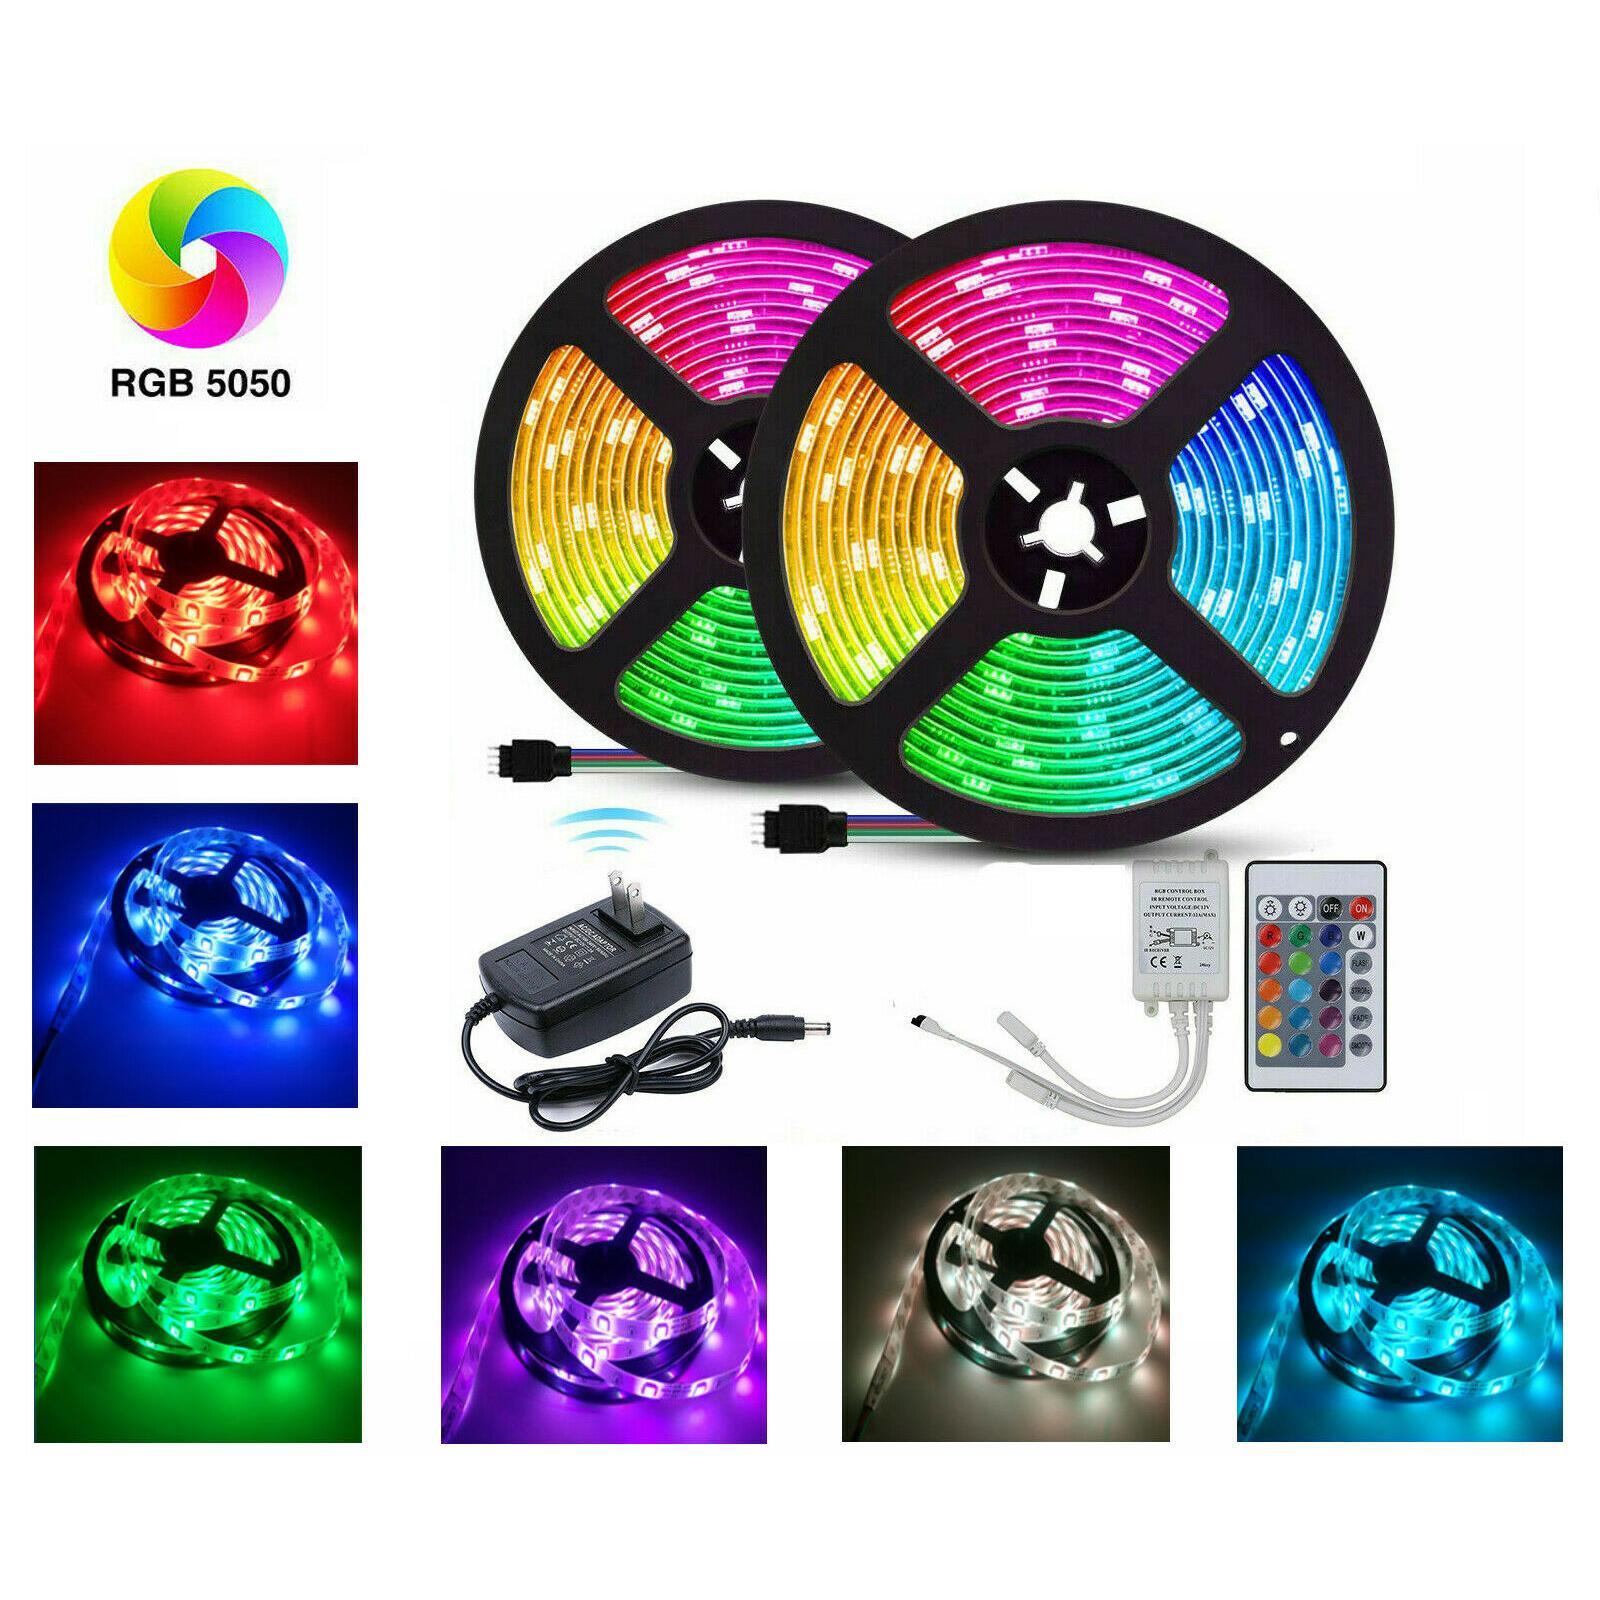 Nastro Striscia 10m LED Light String Impermeabile flessibile luce LED Ribbon 5050 lampade principali Con Power Plug controller